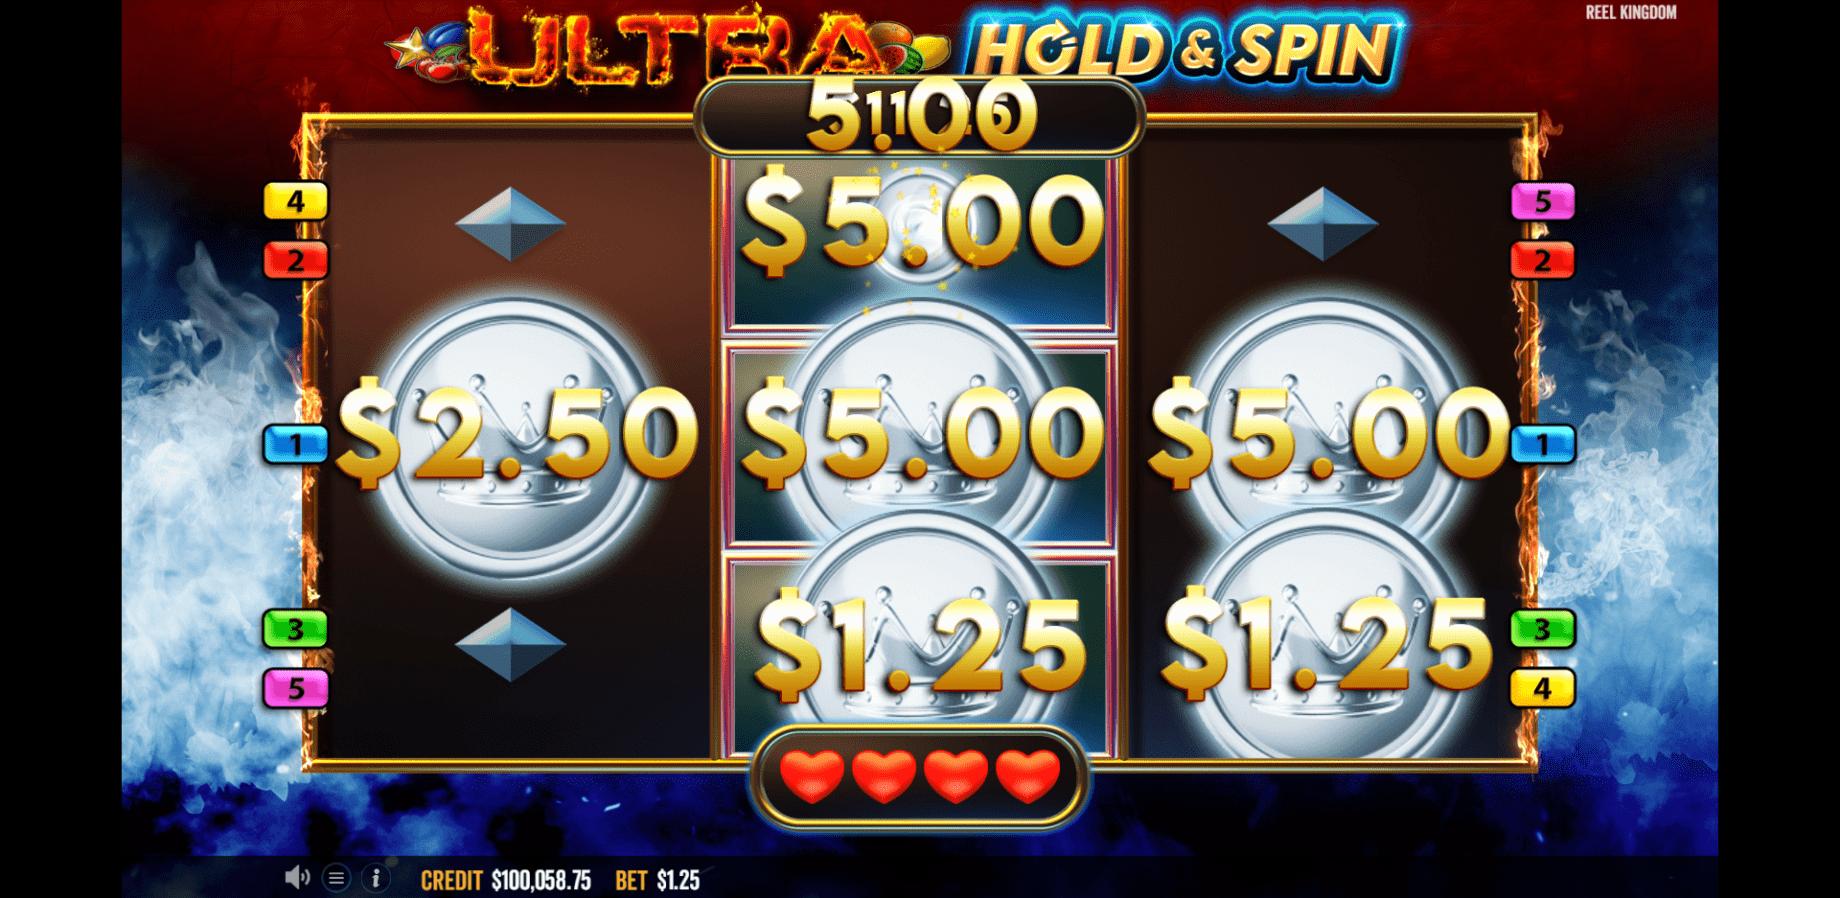 Ultra Hold & Burn สล็อต รีสปิน เหรียญเงิน